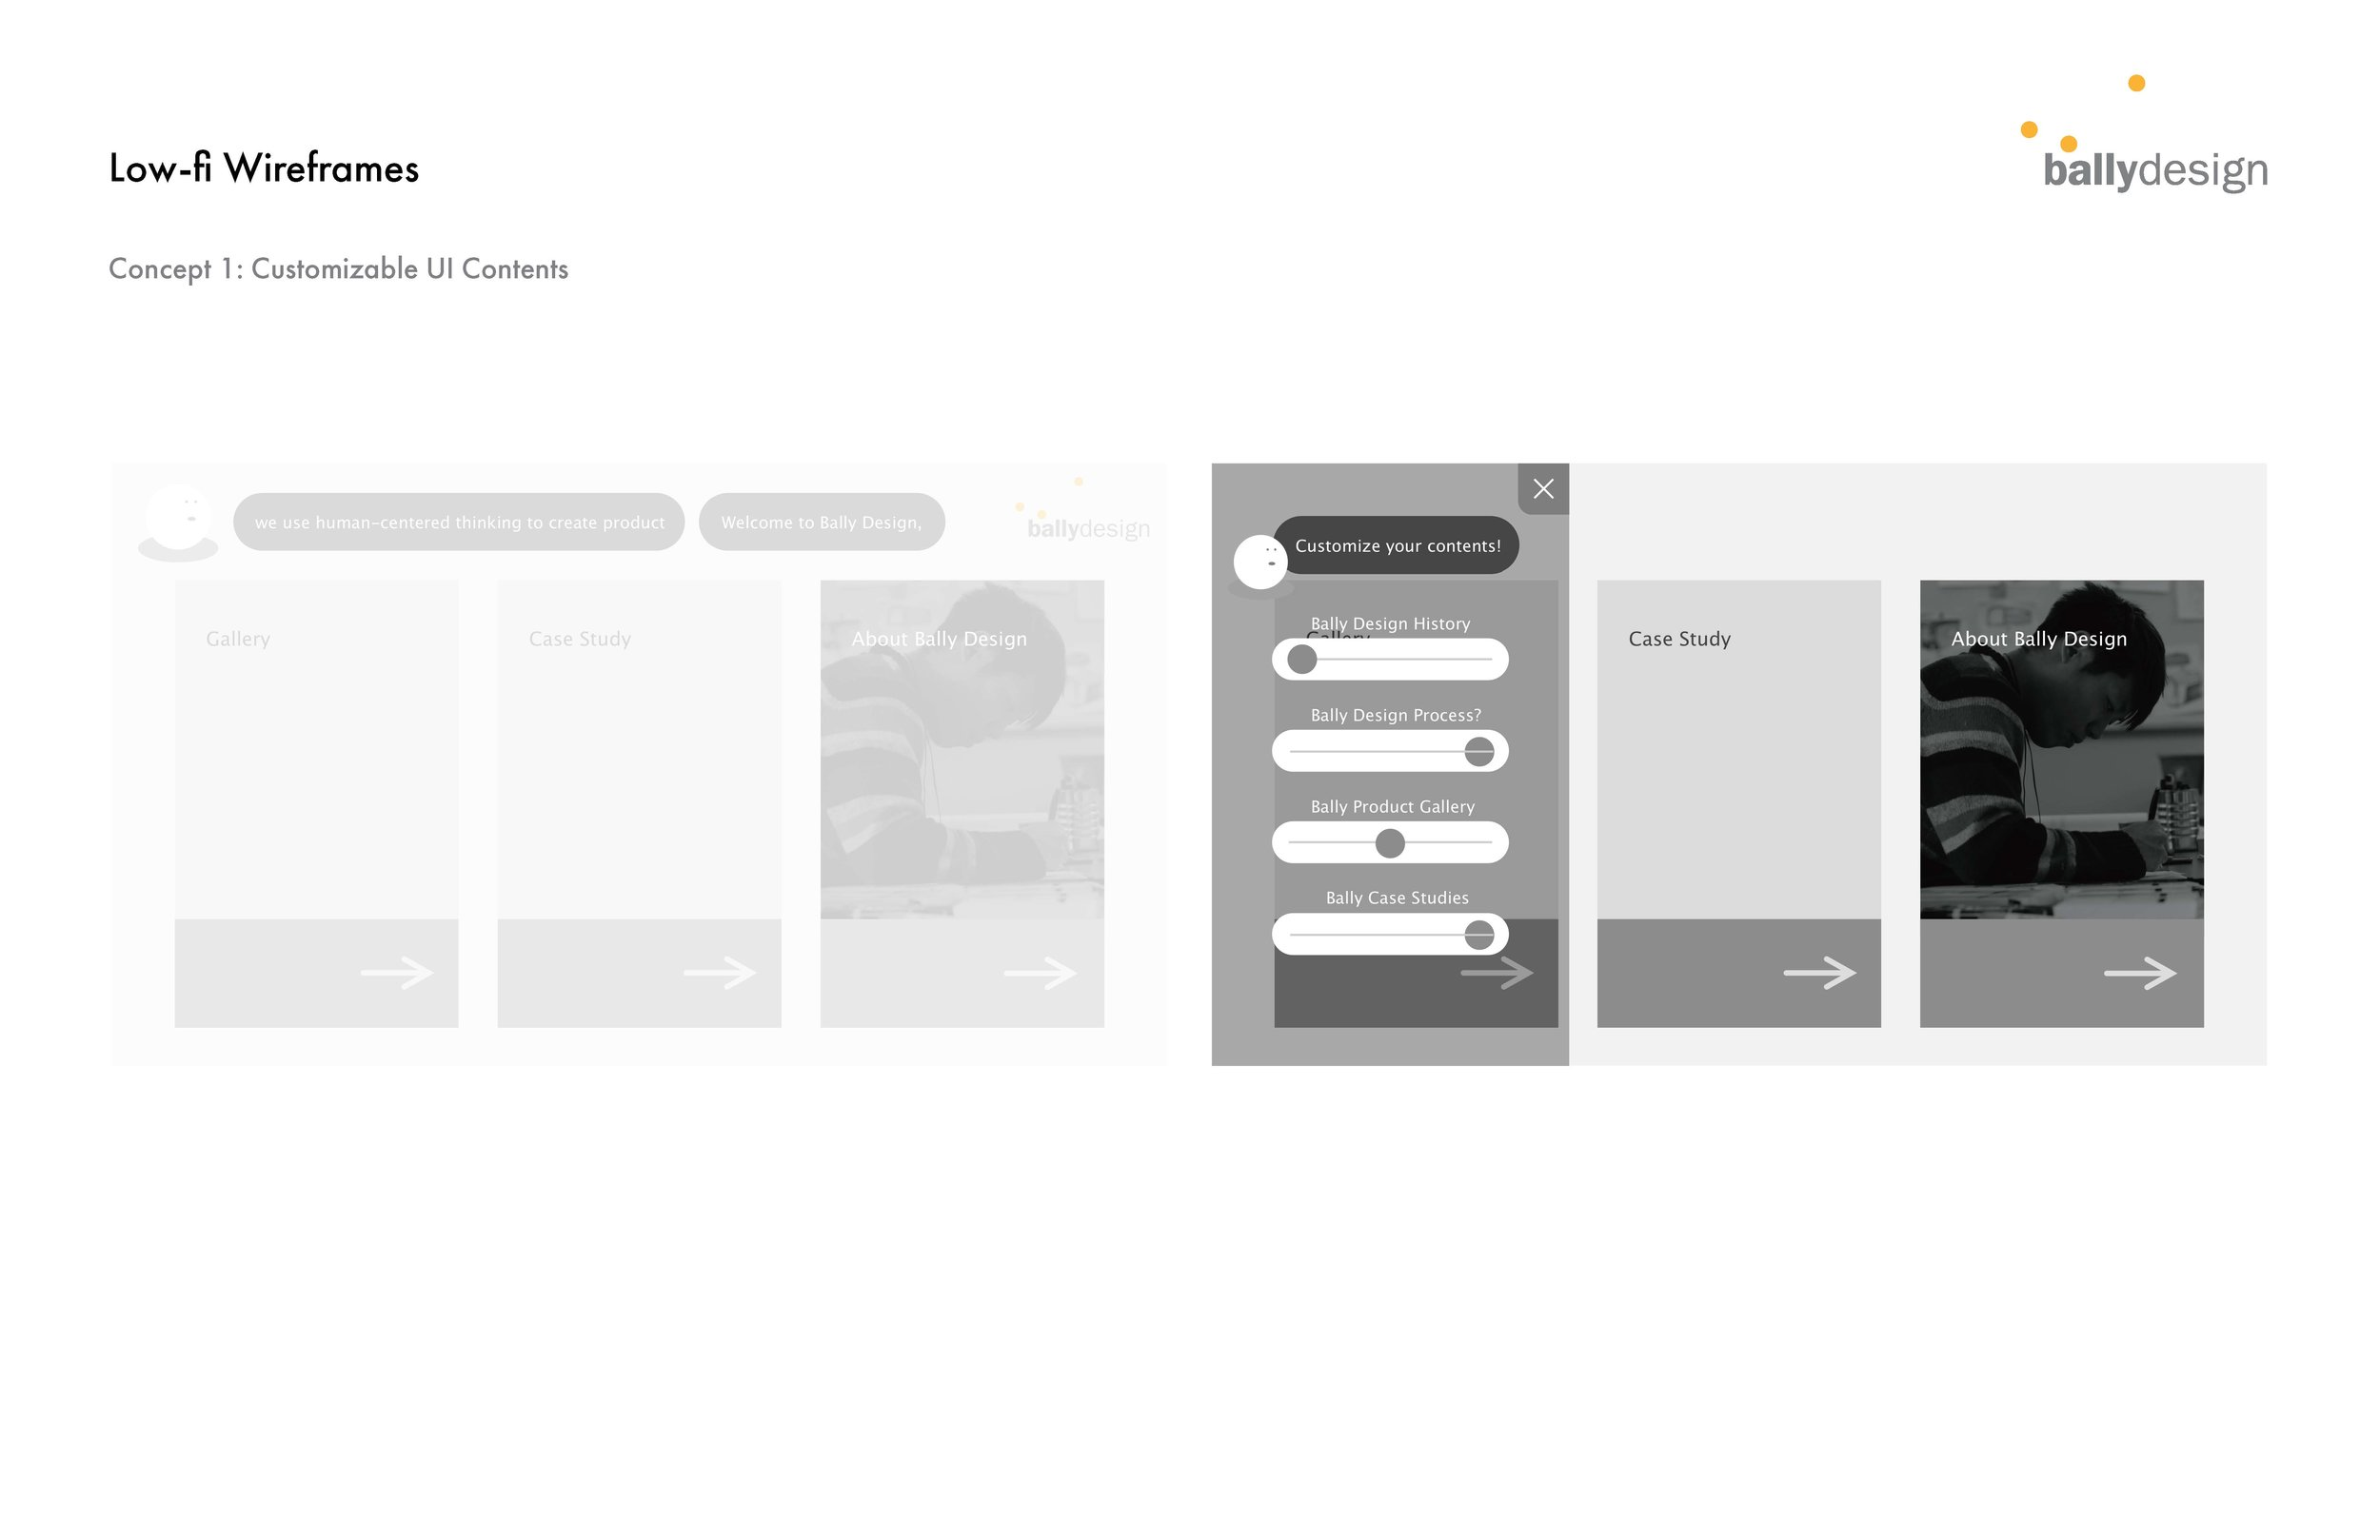 Real_Internship Final Presentation_Page_58.jpg